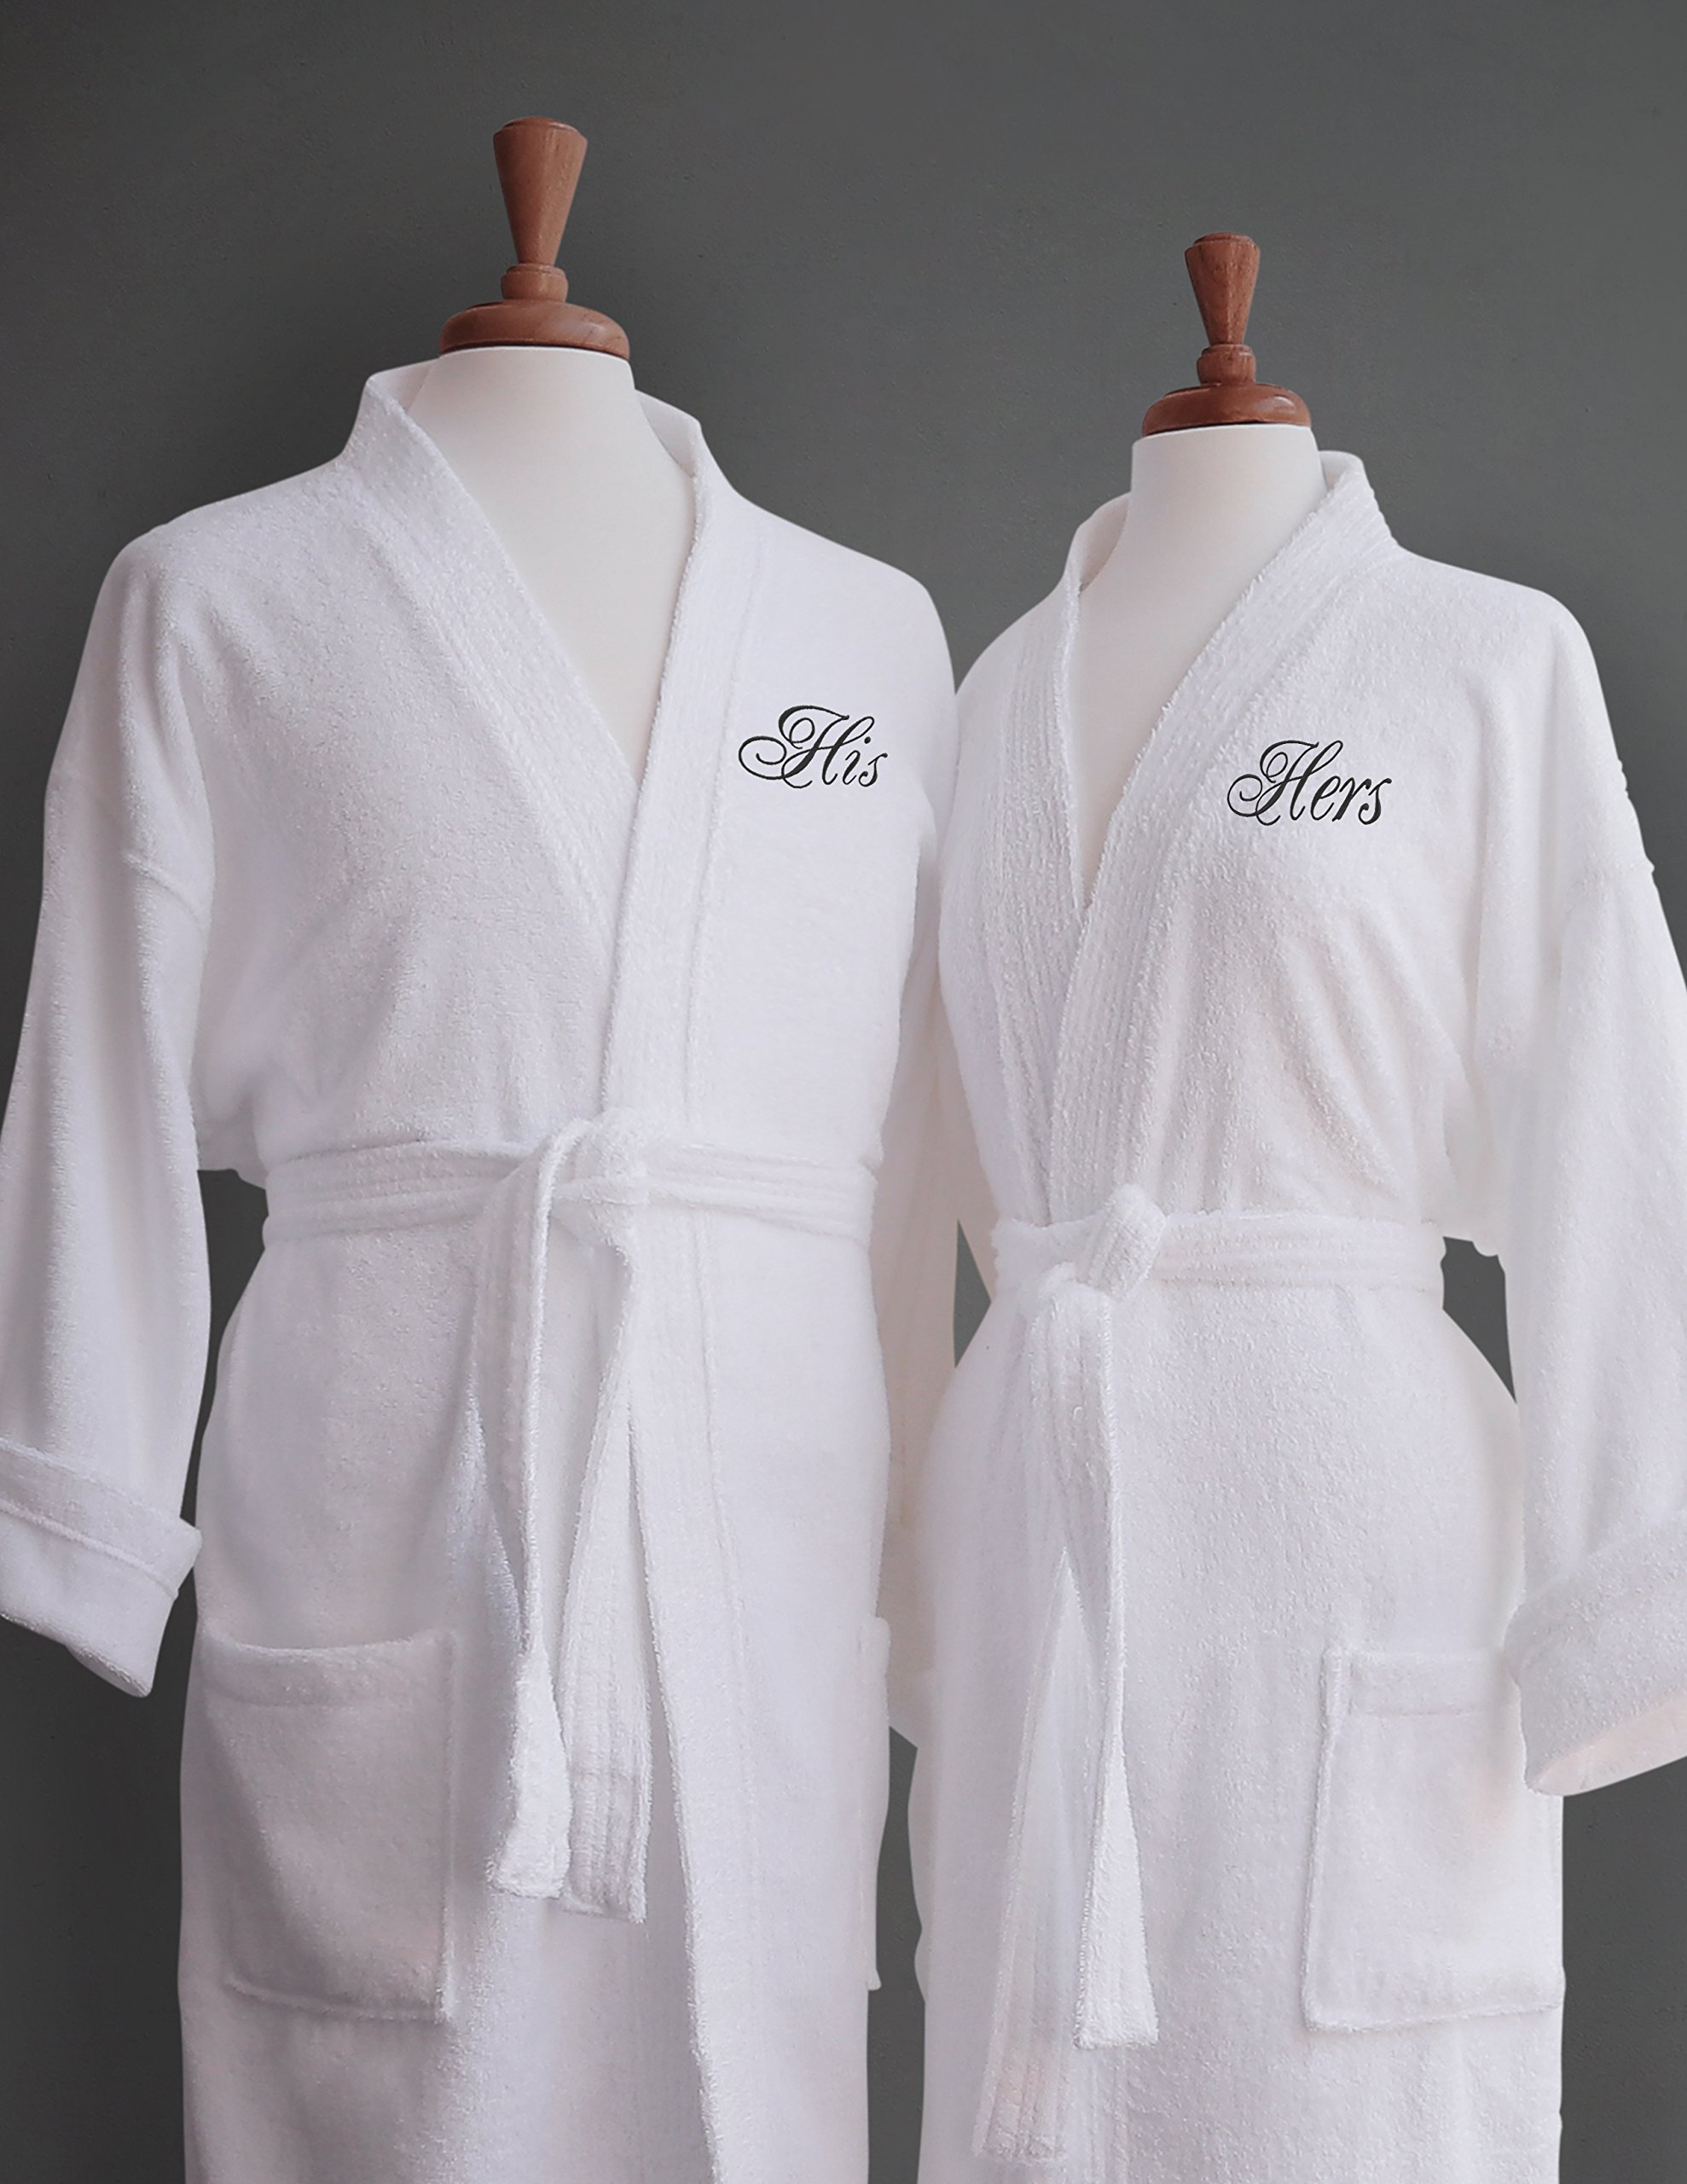 0fa540a9ed Get Quotations · Luxor Linens - Terry Cloth Bathrobes - 100% Egyptian  Cotton His   Her Bathrobe Set